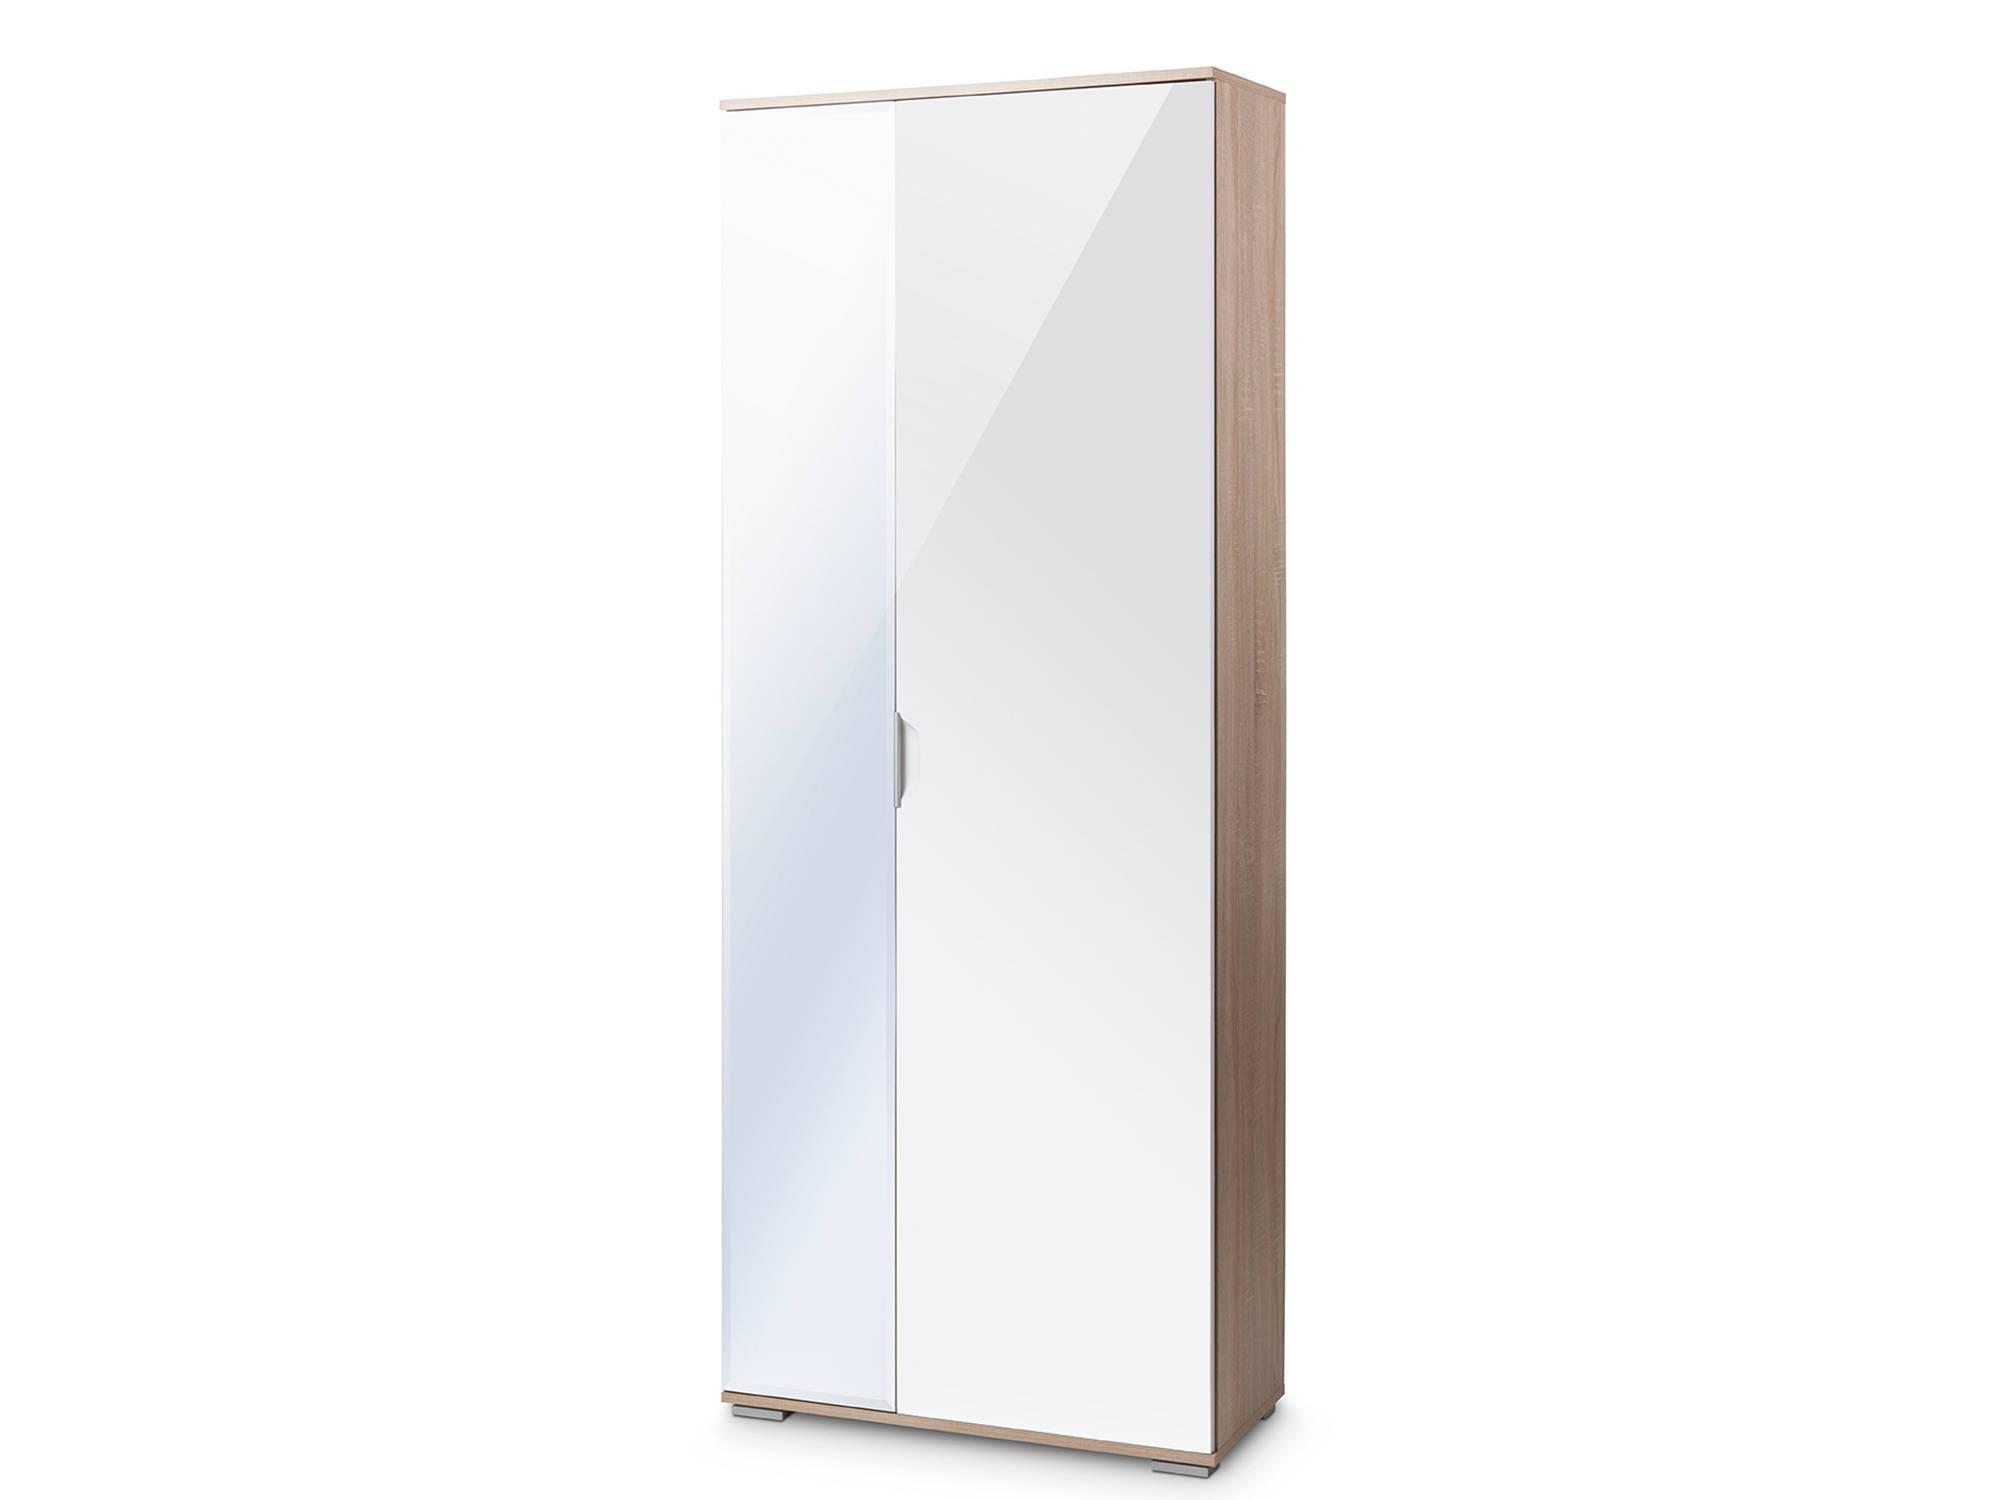 Шкаф Нова шкаф для одежды нова пм 156 03